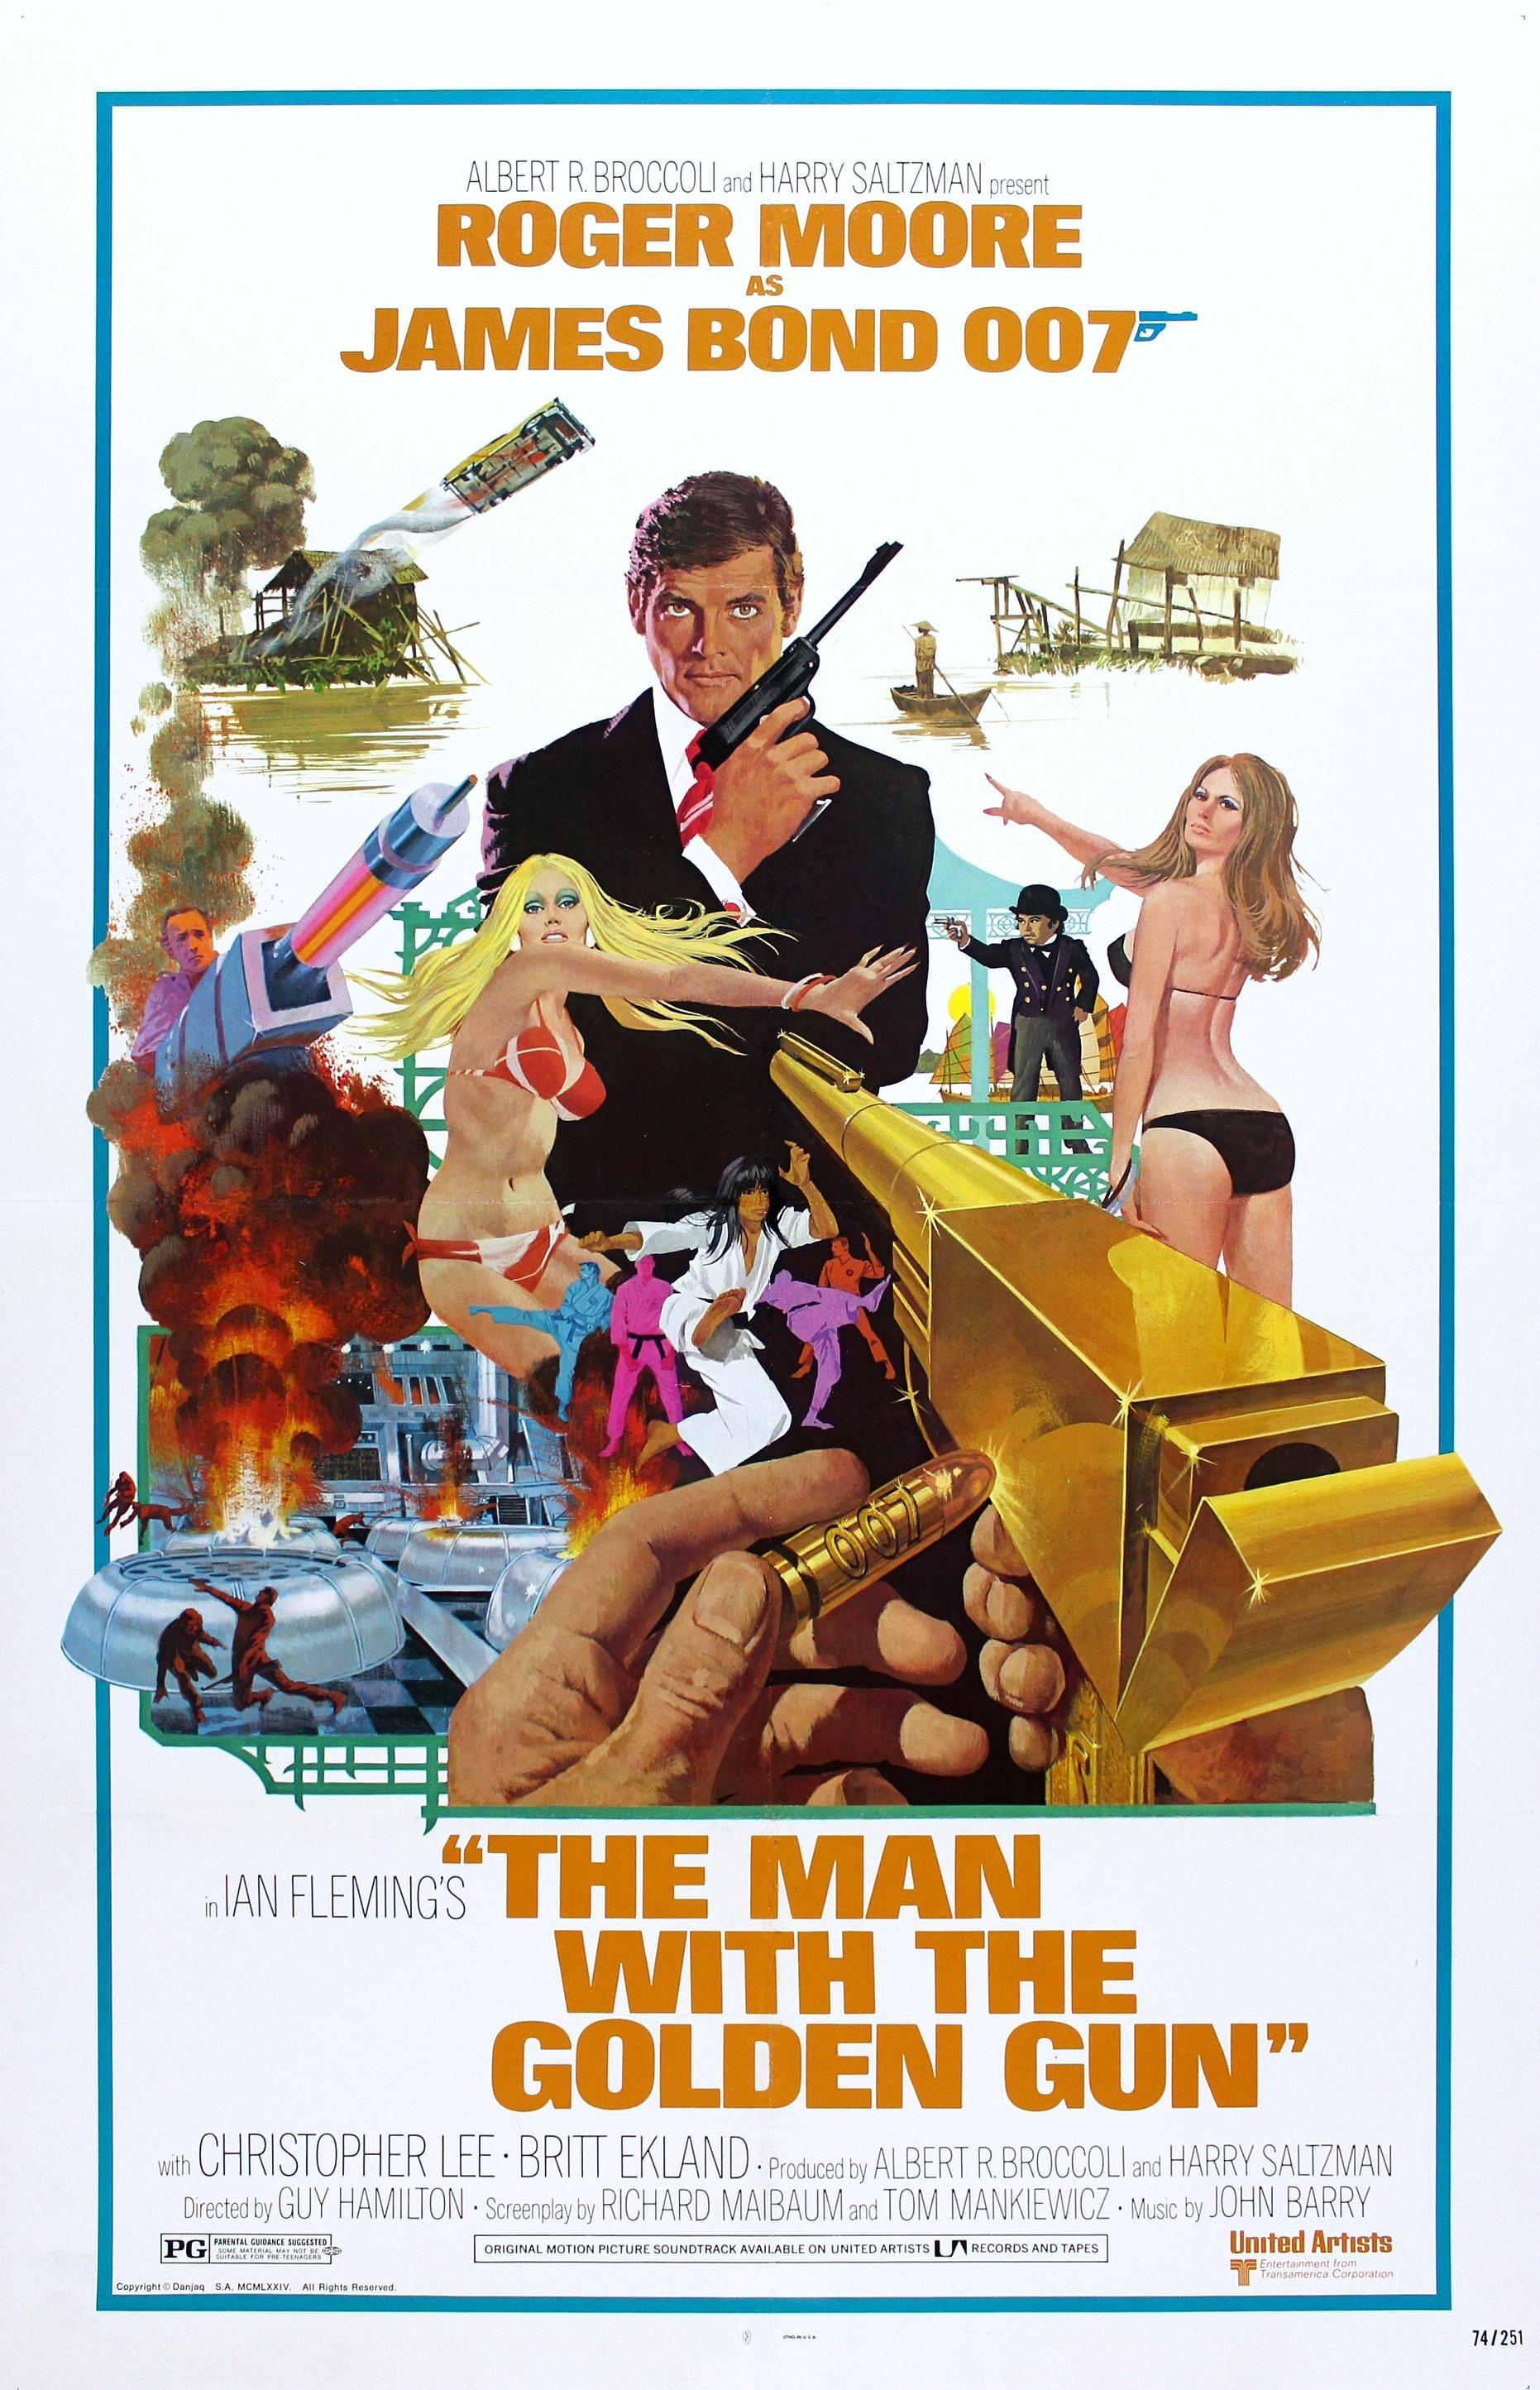 The Man with the Golden Gun kapak